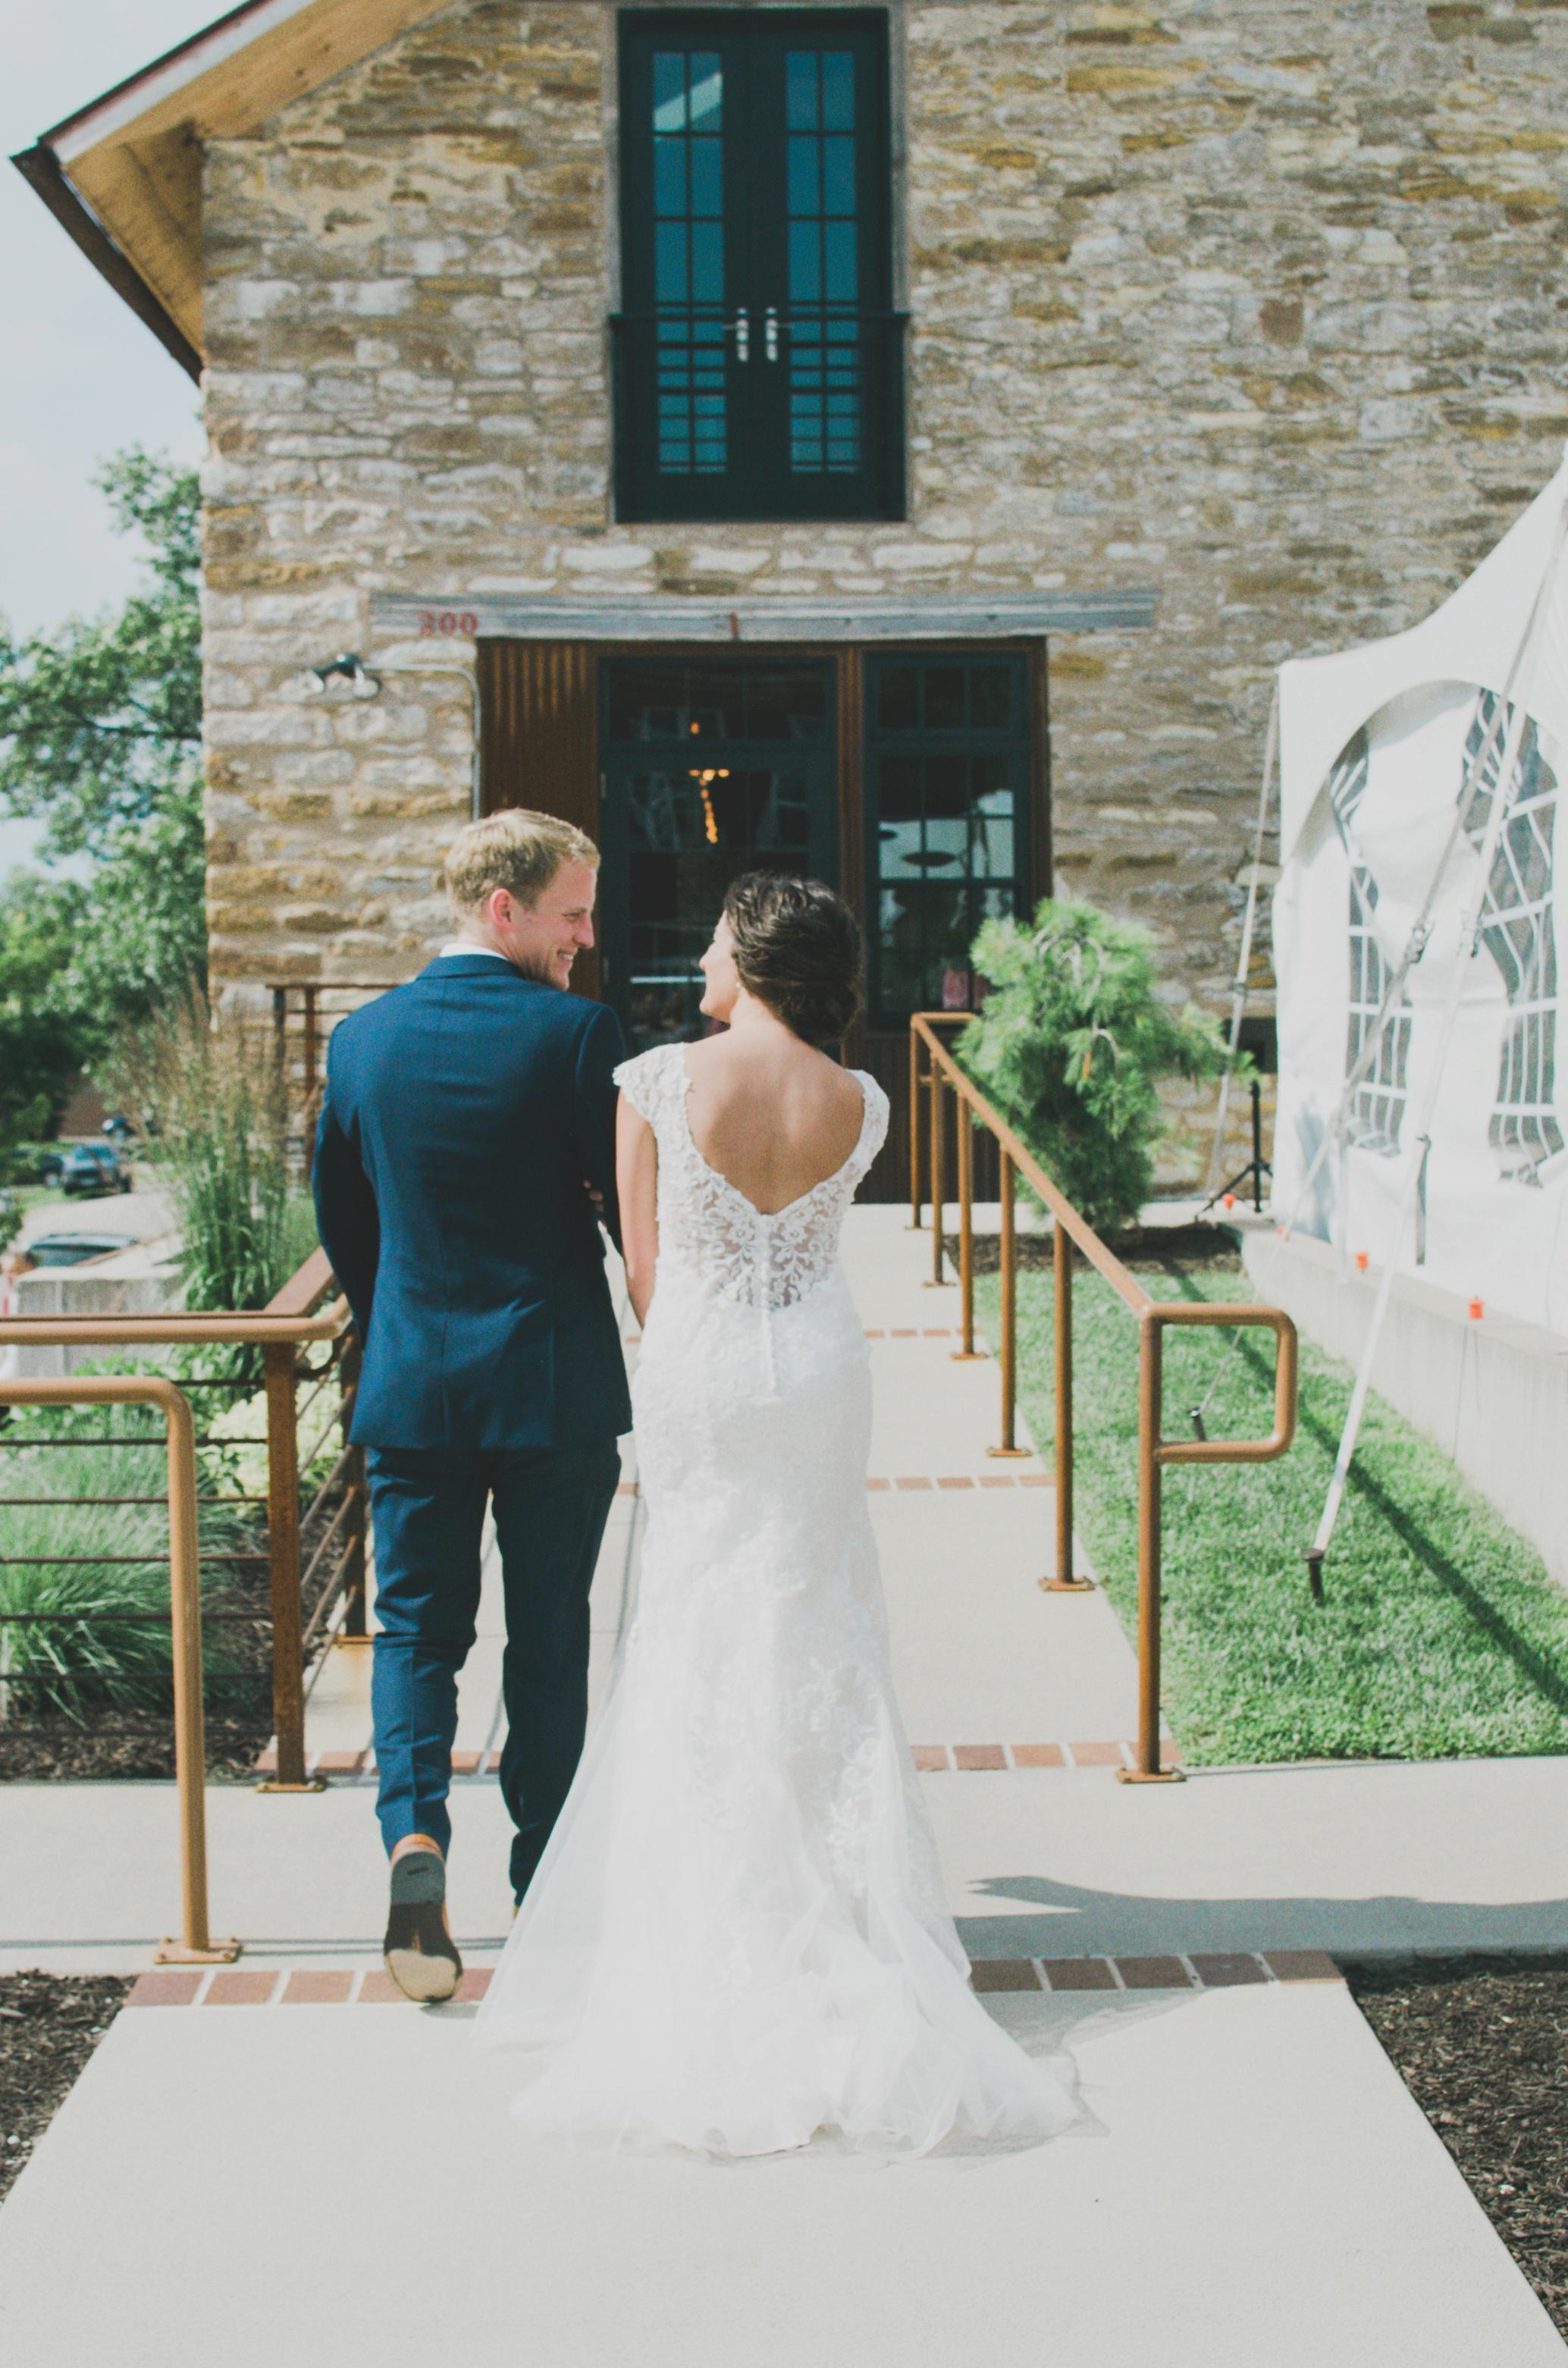 Palmer House and Stable Solon, IA | Ali Leigh Photo Minneapolis Wedding Photographer_0279.jpg